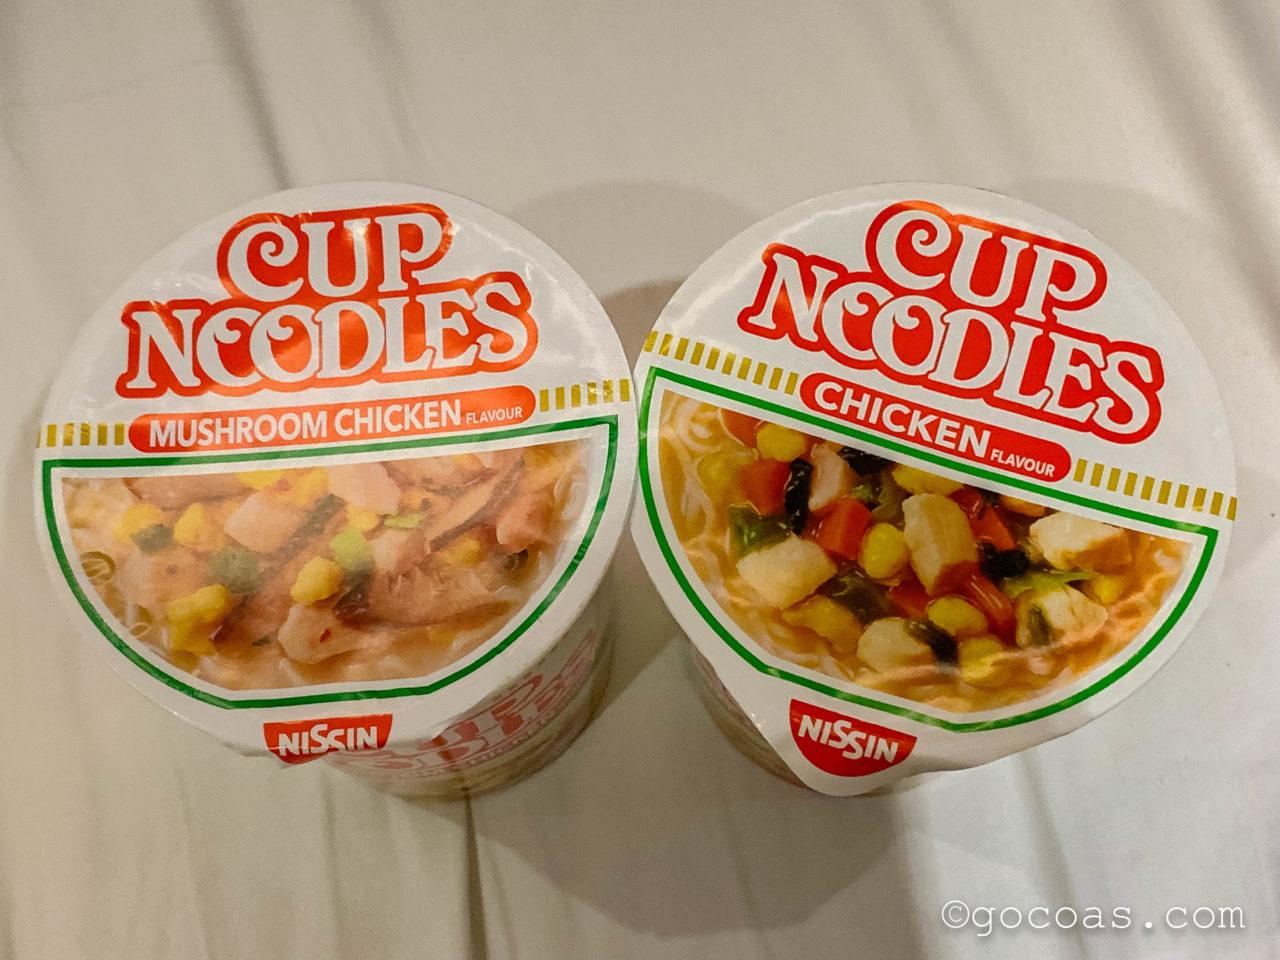 Kallang駅のコンビニで買ったカップ麺